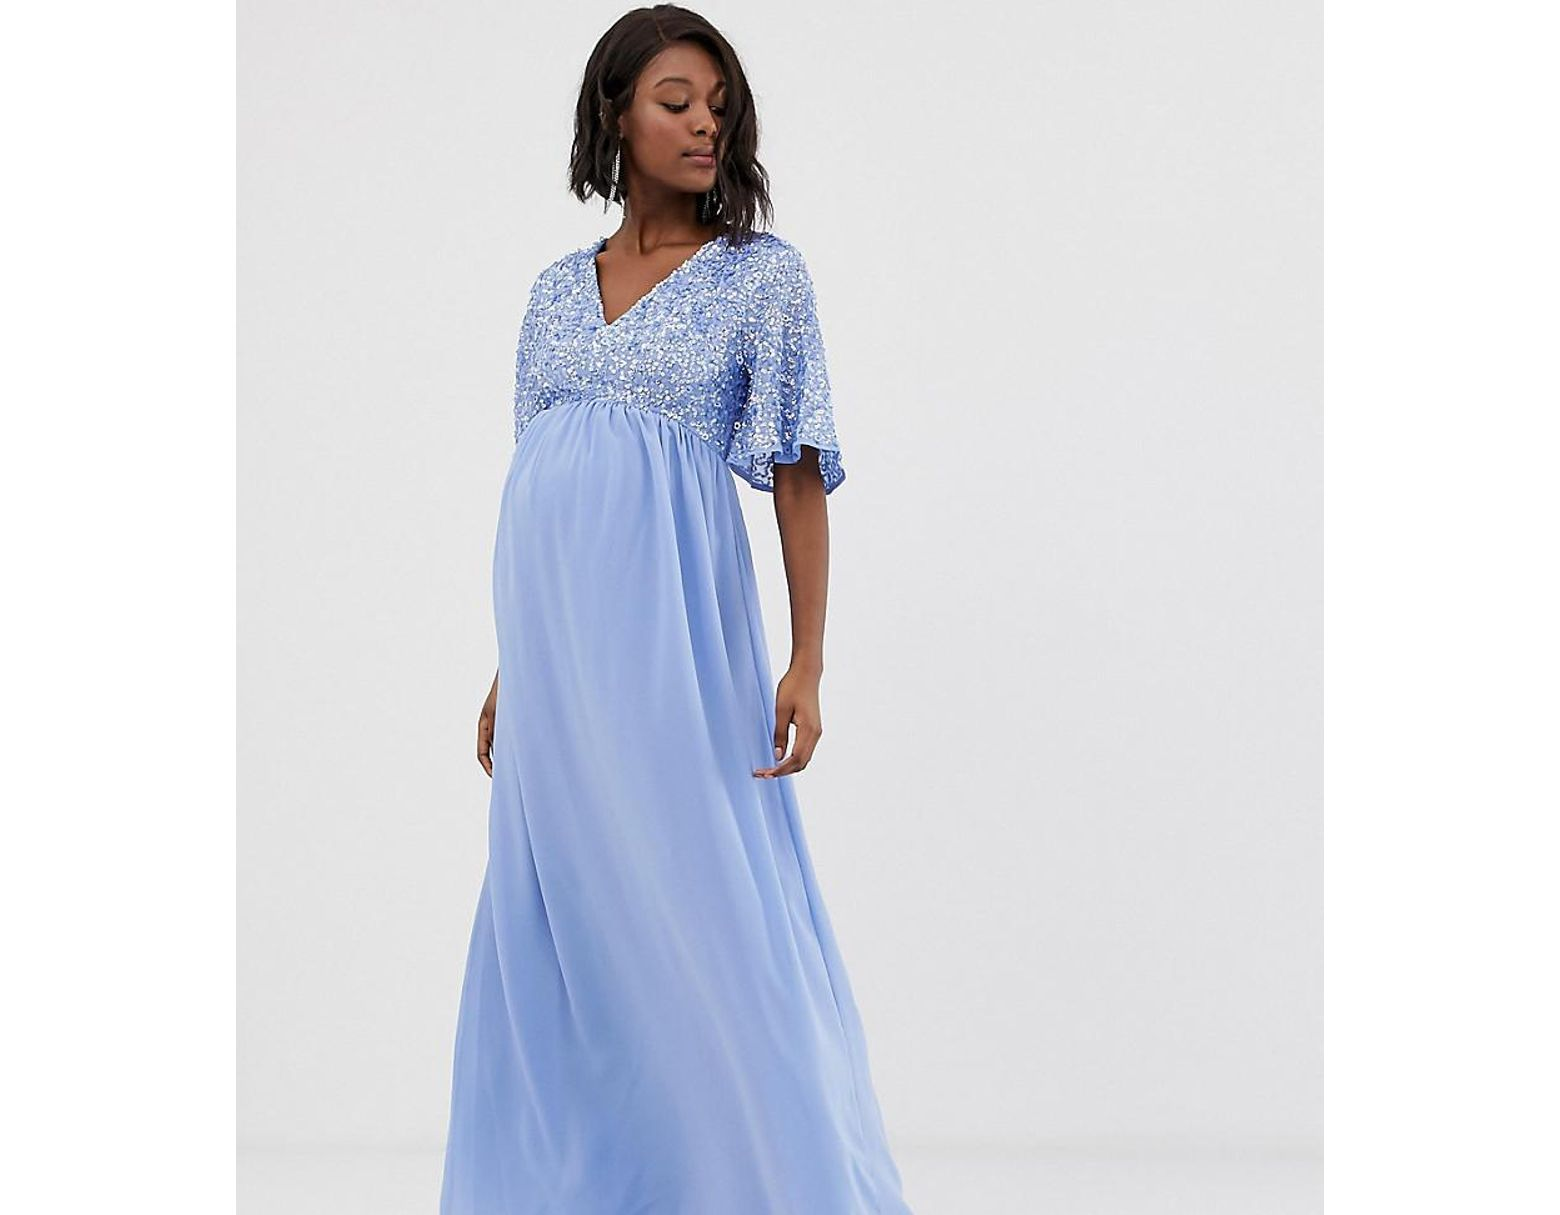 c3abf516 Maya Petite Long Sleeve Sequin Top Maxi Tulle Dress